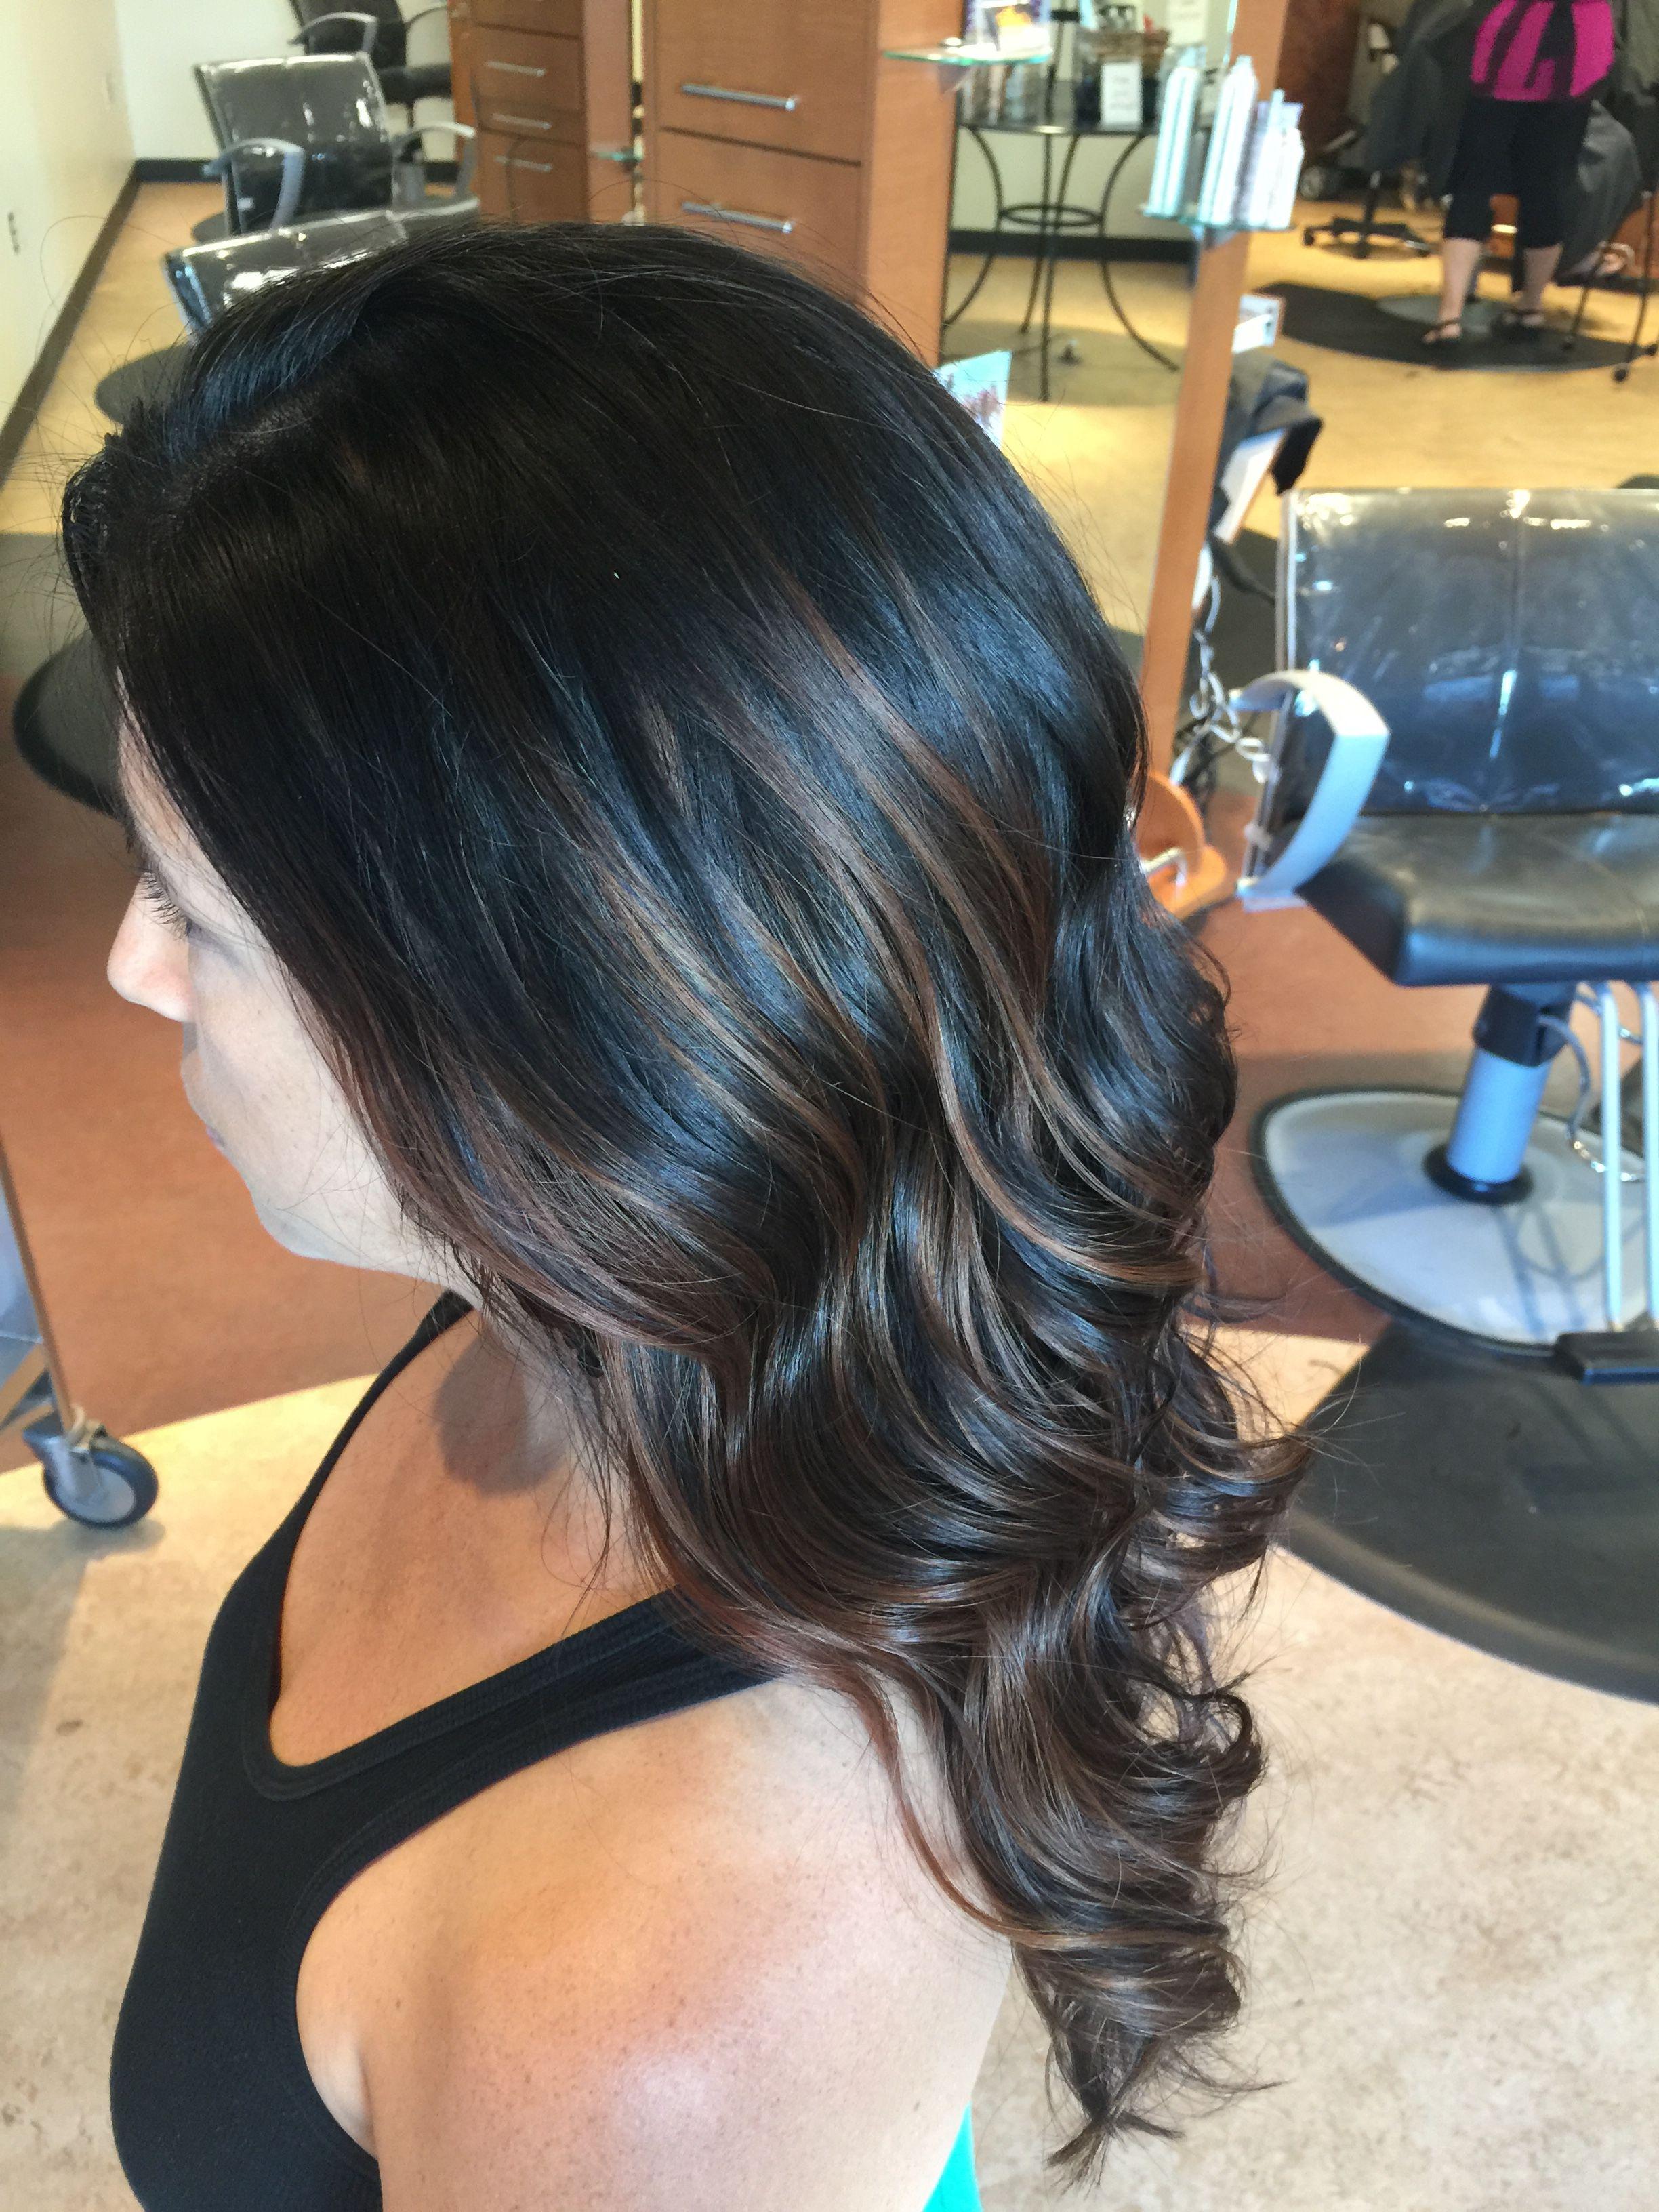 Hair By Jordan Eller Eclektica Salon Kansas City Balayage Chocolatebrown Brownhairwithhighlights Hand Paint Brown Hair With Highlights Hair Hair Painting